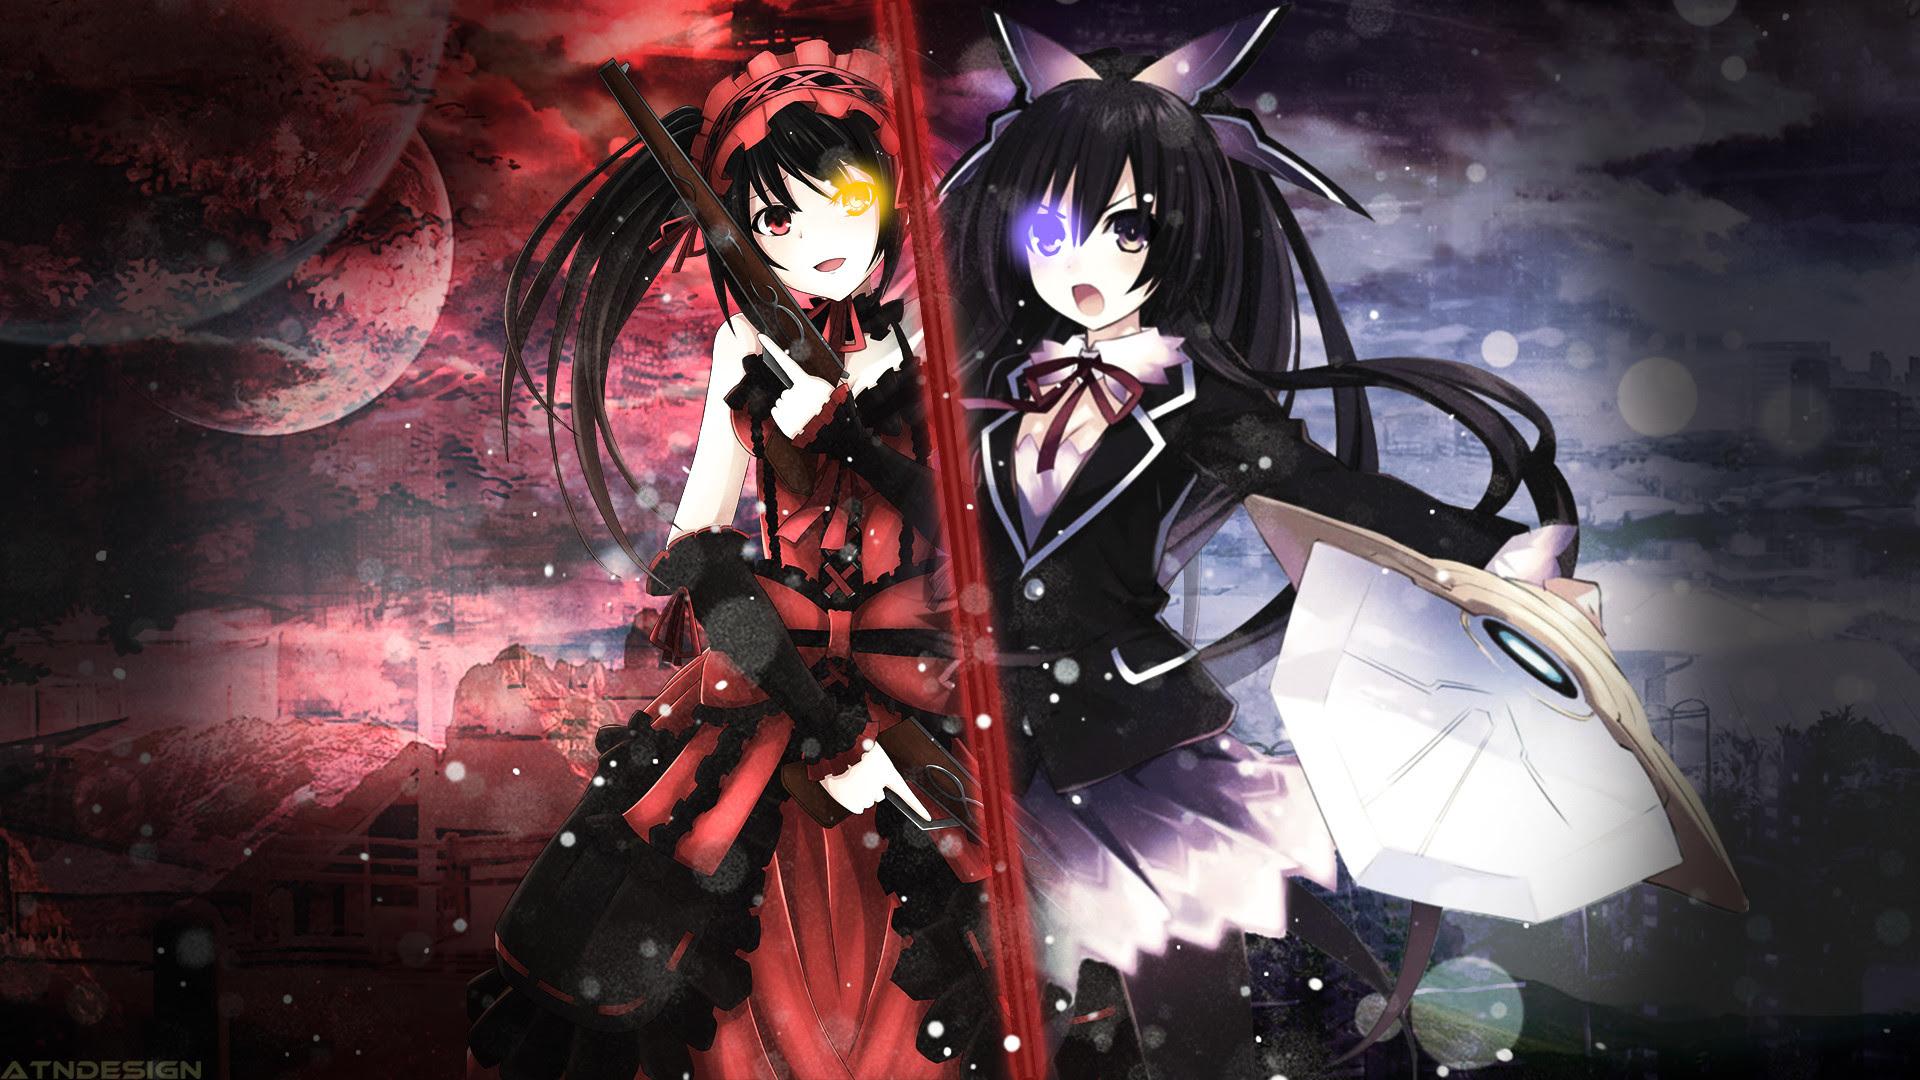 Download 8000 Wallpaper Anime Date A Live Hd HD Terbaru